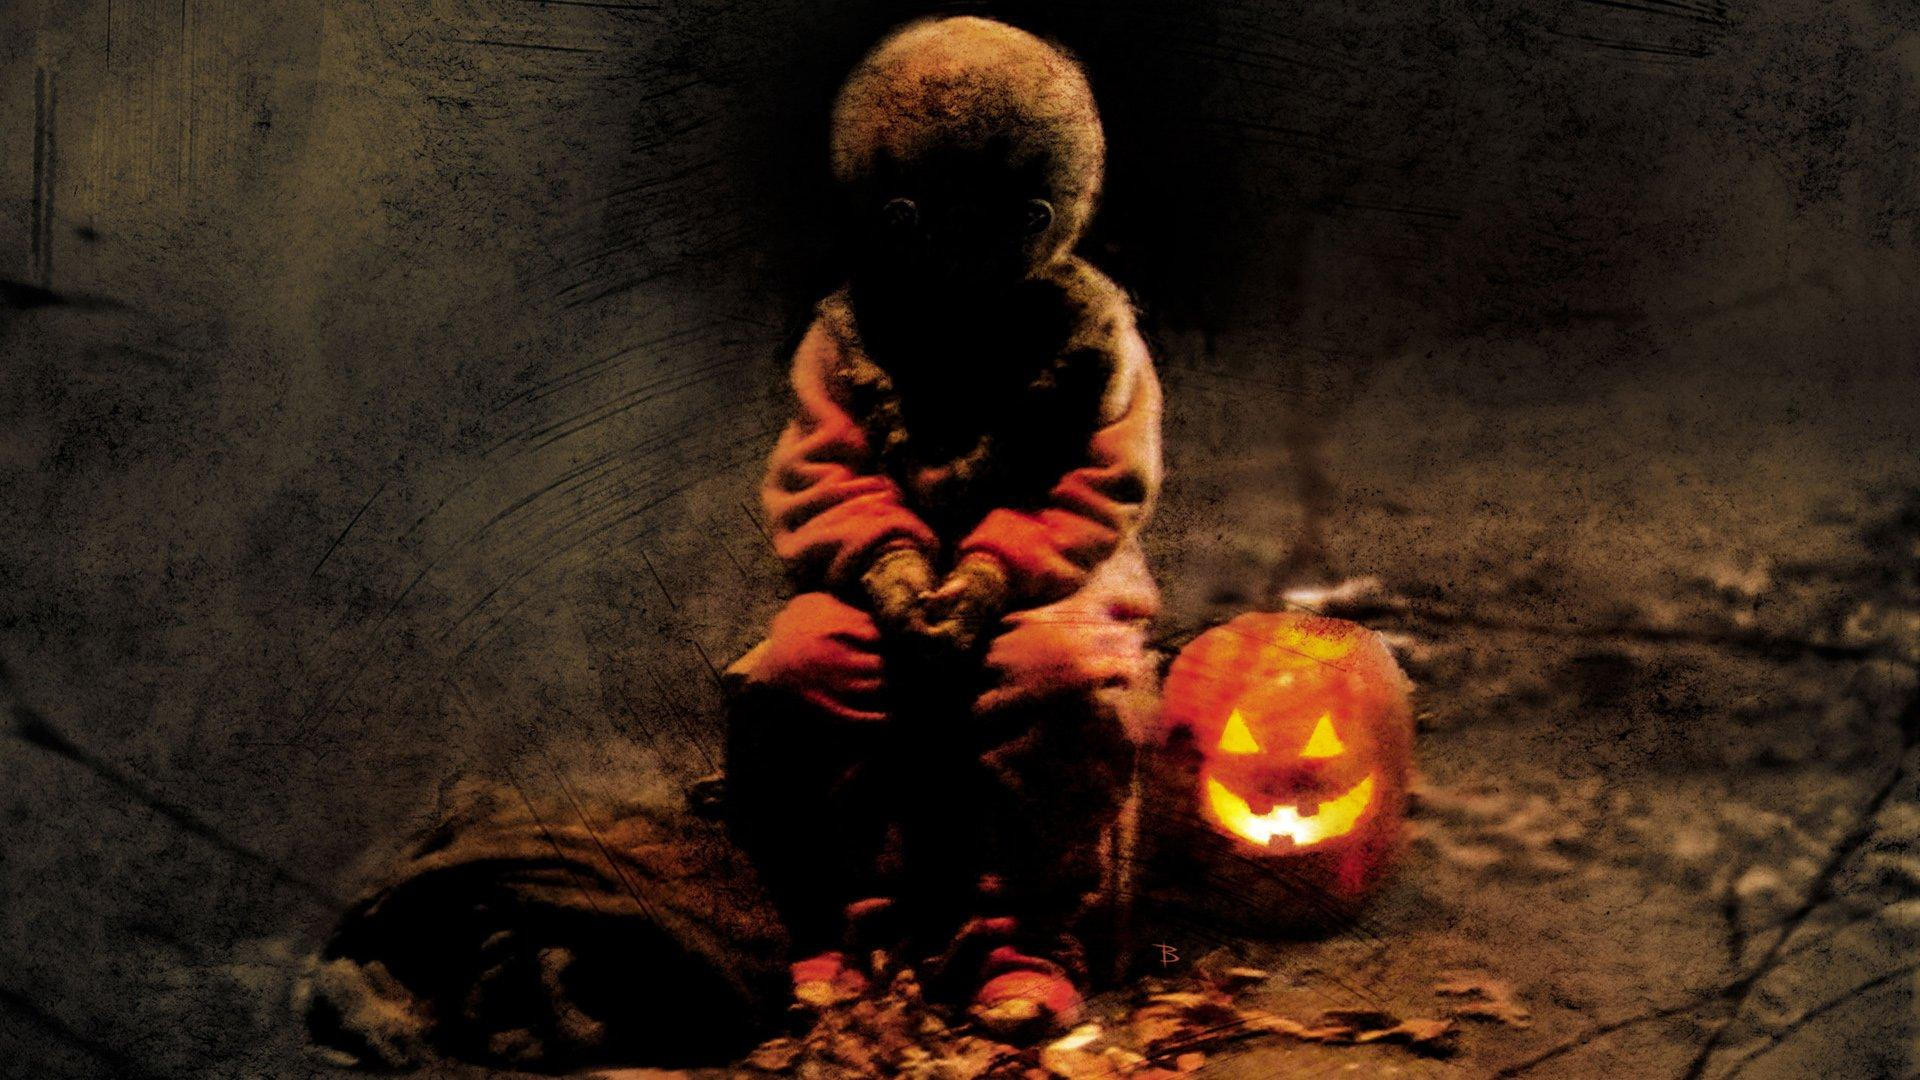 CreepyShake - Halloween